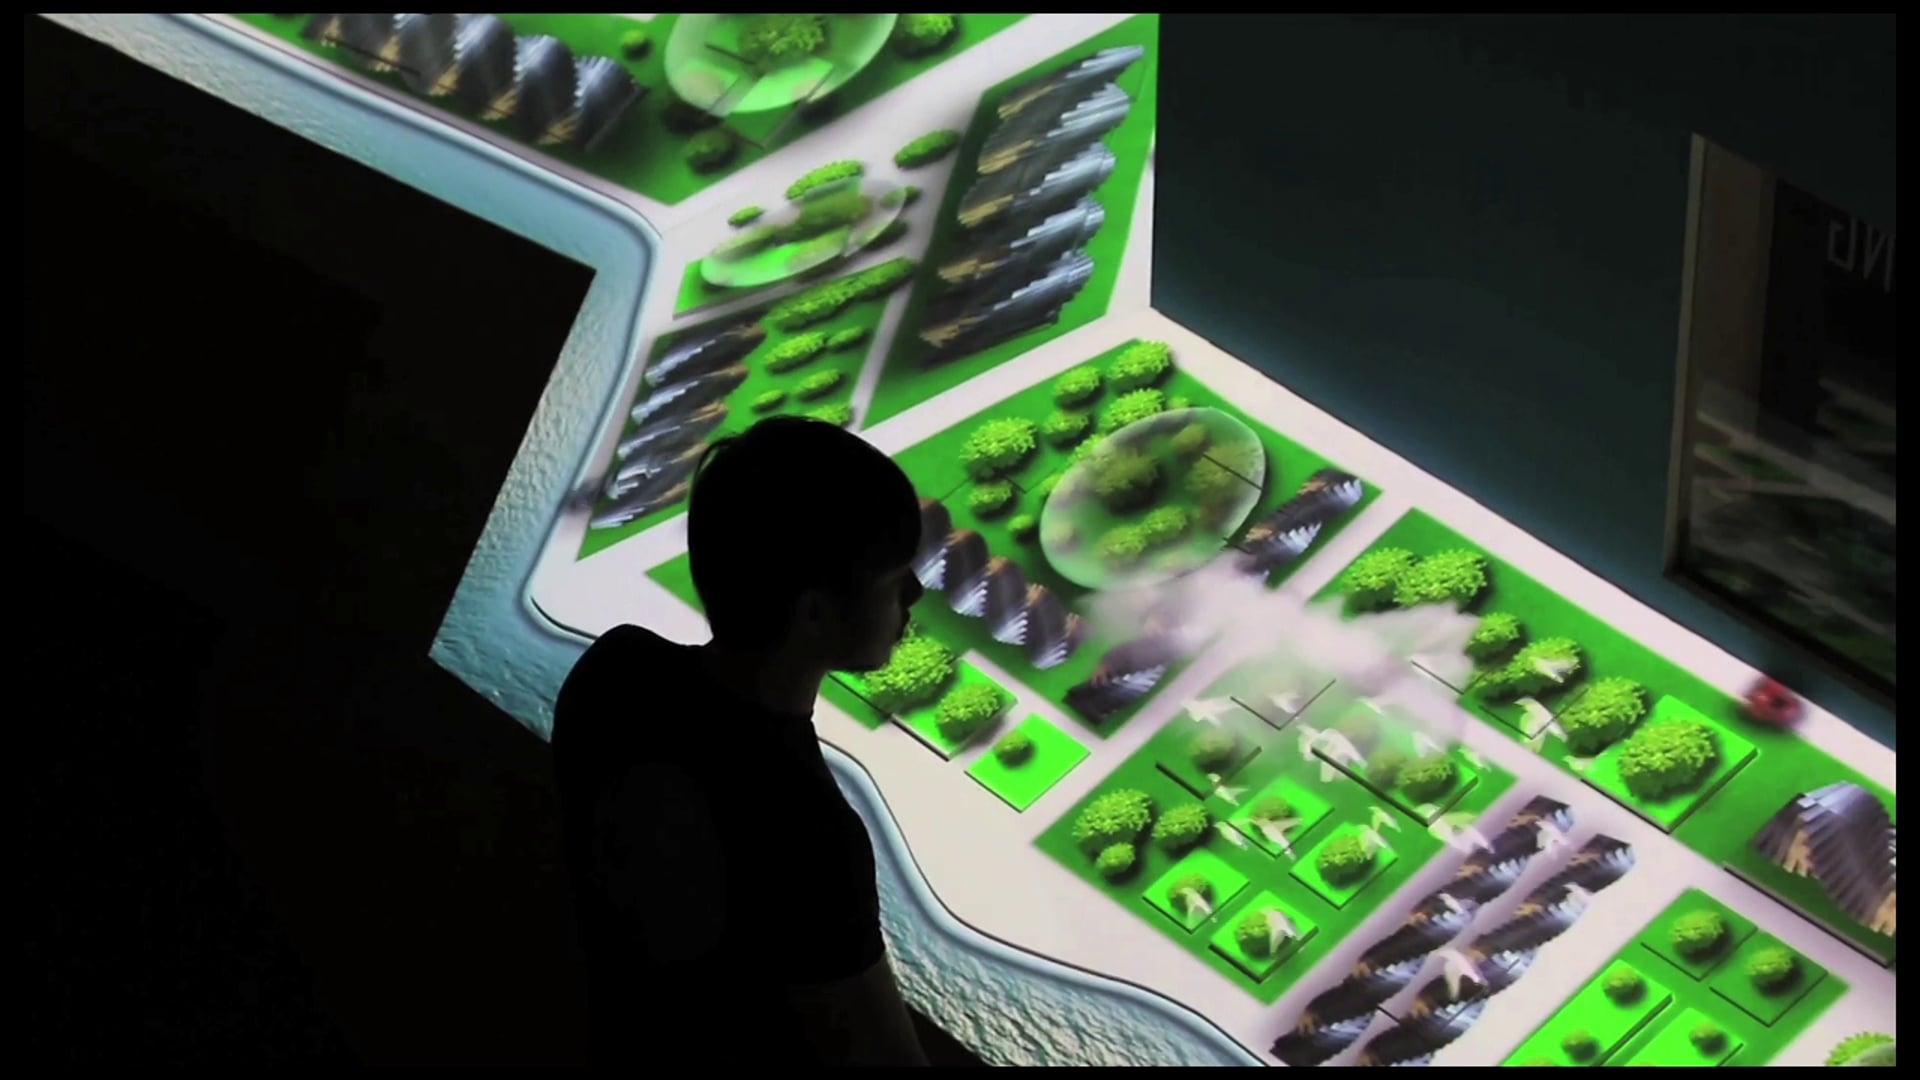 Climate Change - Multimedia exhibition